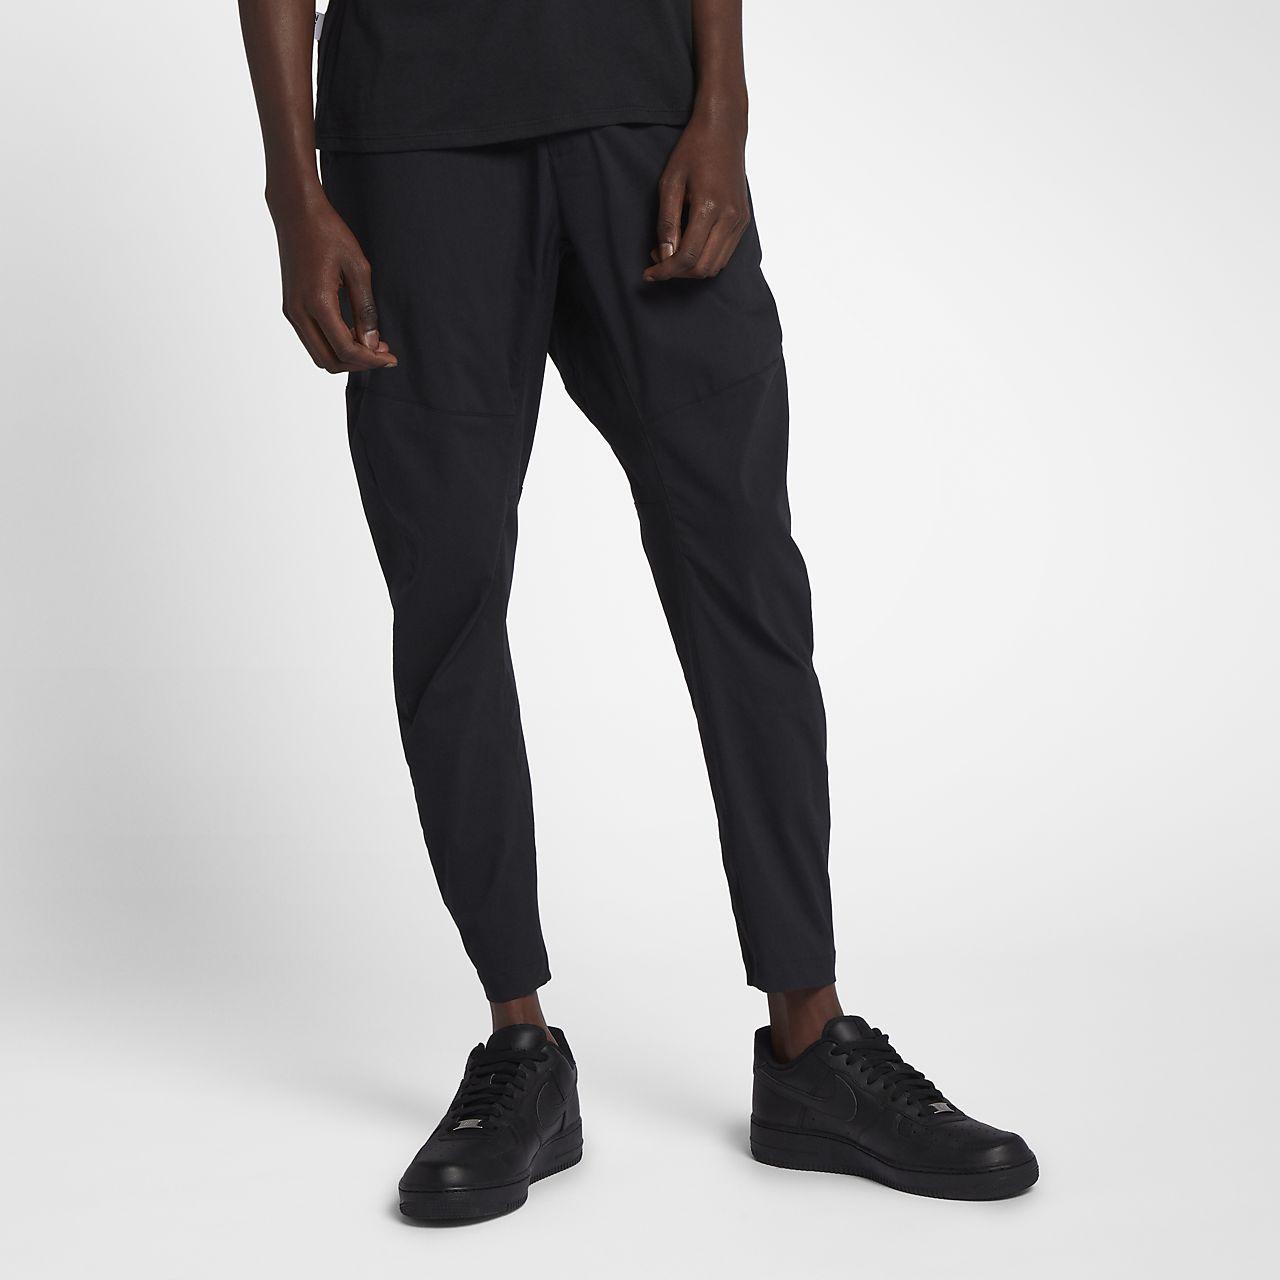 cheaper a2447 b29ad Pantaloni Nike Sportswear Tech Pack - Uomo